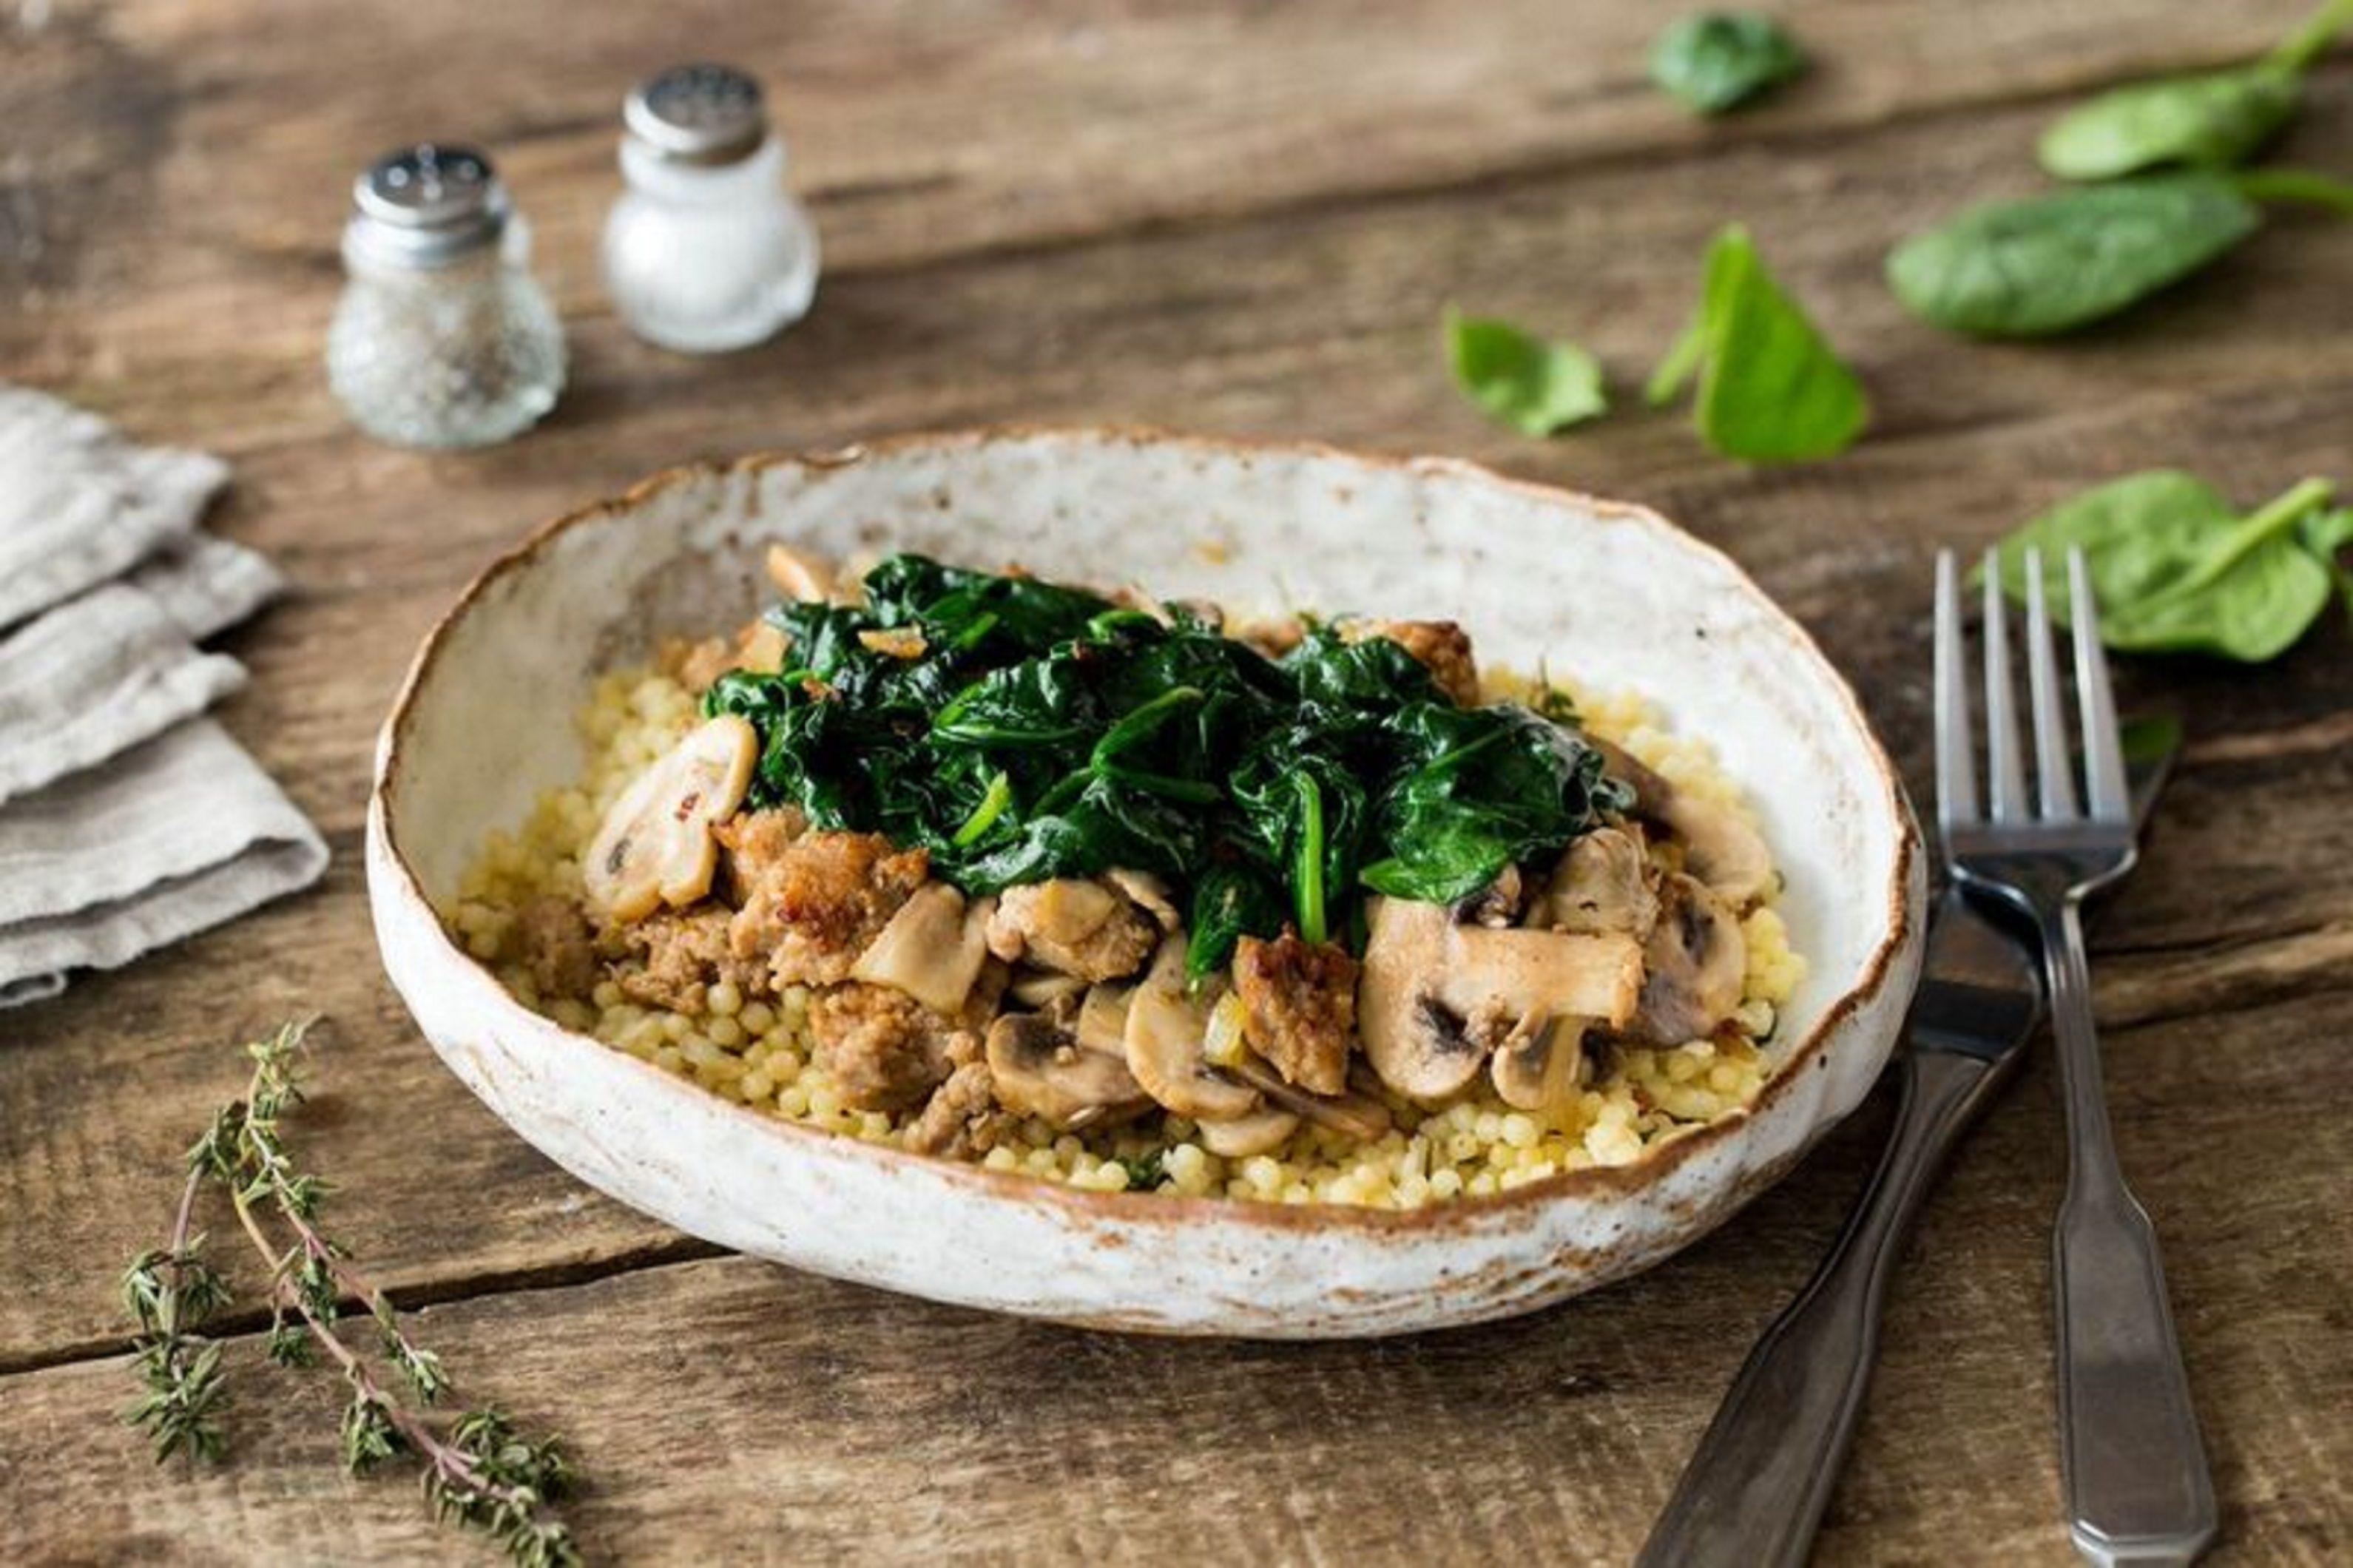 Fregola Sarda & Sweet Italian Sausage with Mushrooms, Wilted Spinach, and Parmesan Recipe | HelloFresh